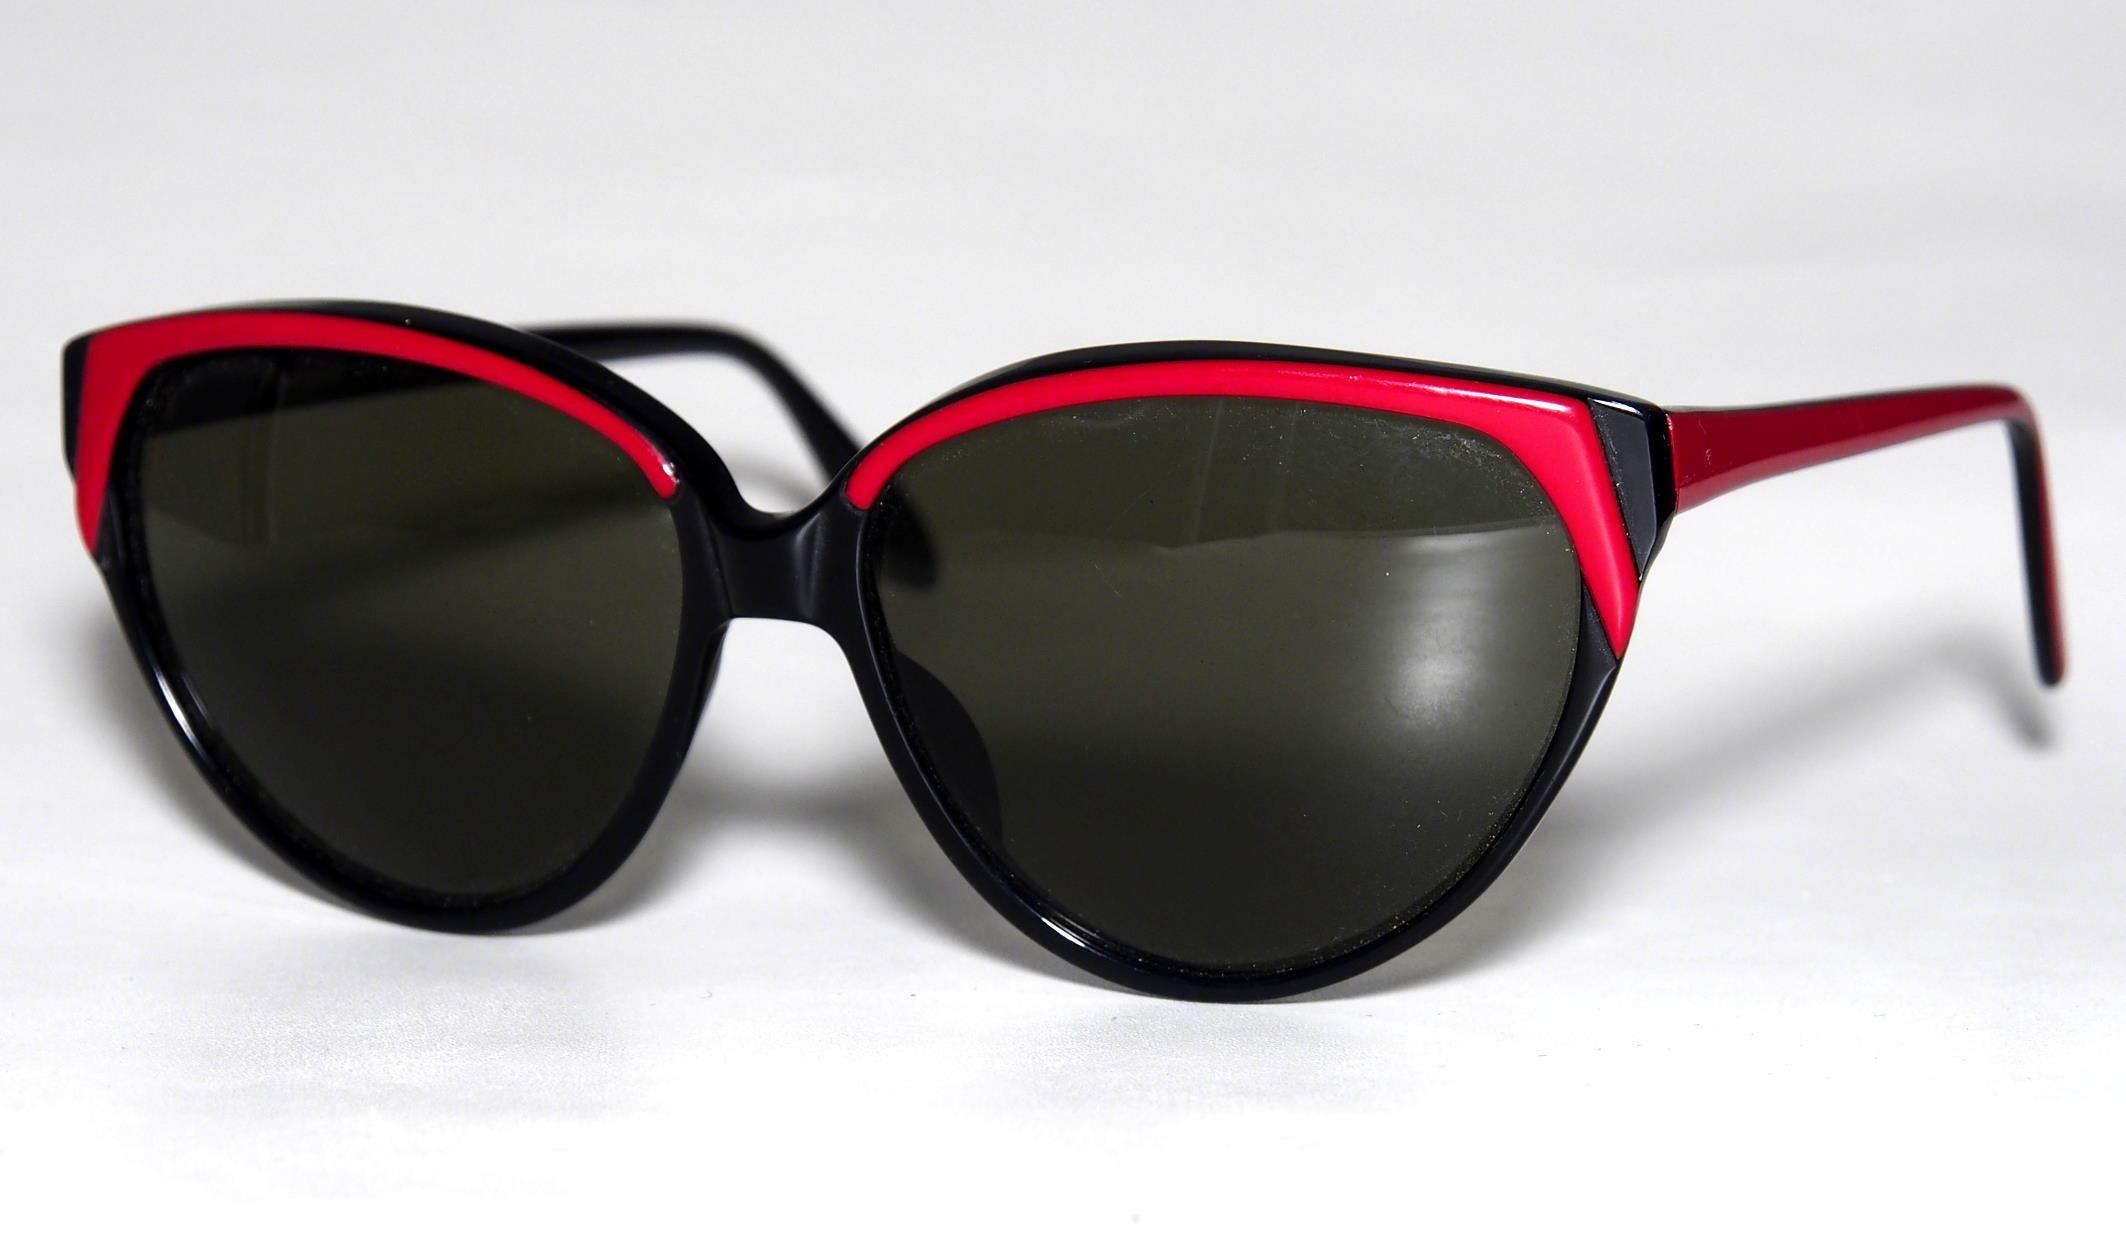 Playgirl Vintage Sonnenbrille der 80er Jahre